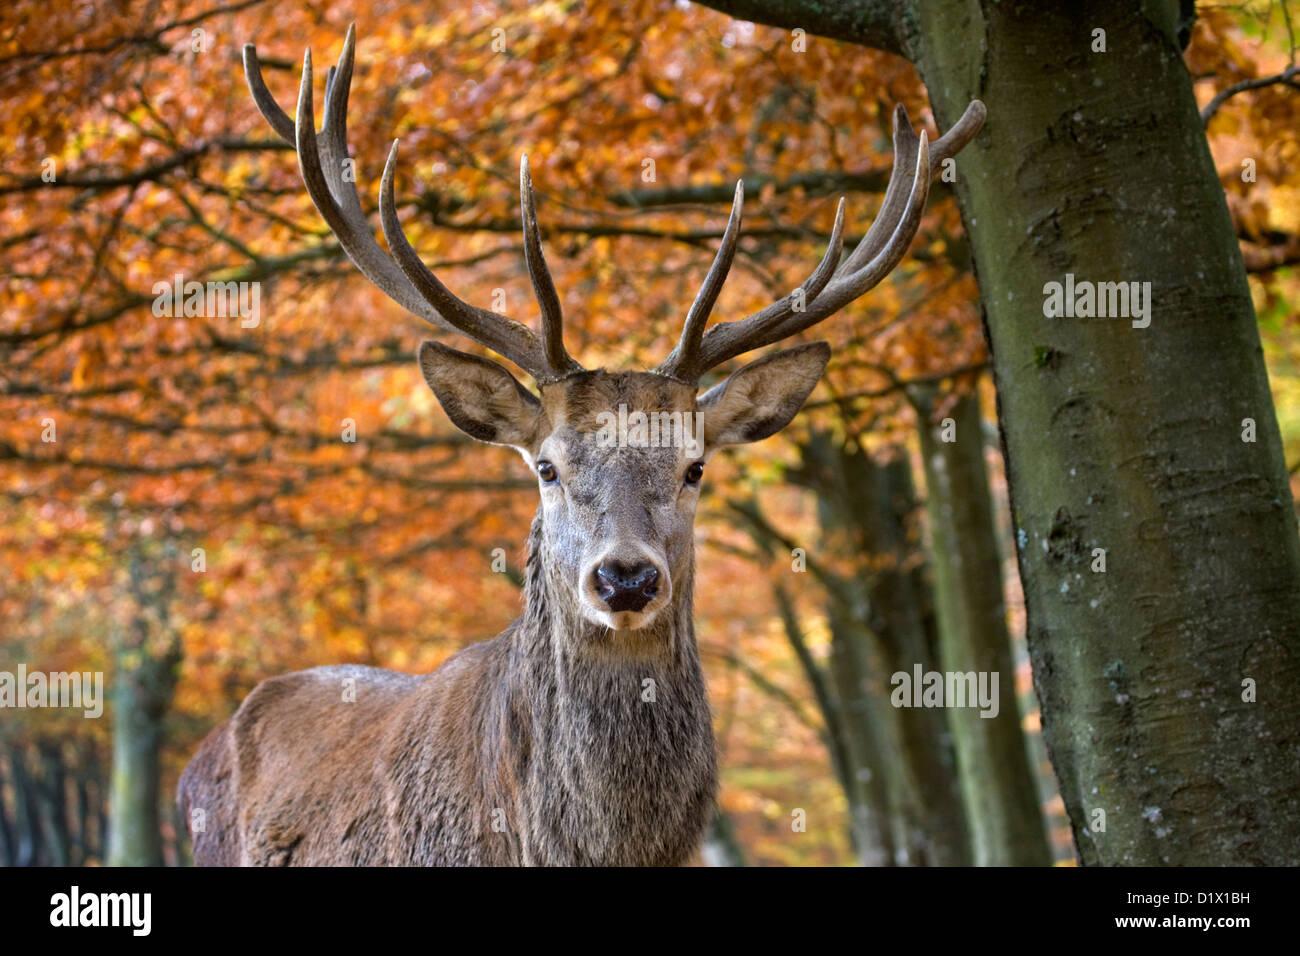 Il cervo (Cervus elaphus) stag close-up in autunno la foresta, Ardenne belghe, Belgio Immagini Stock